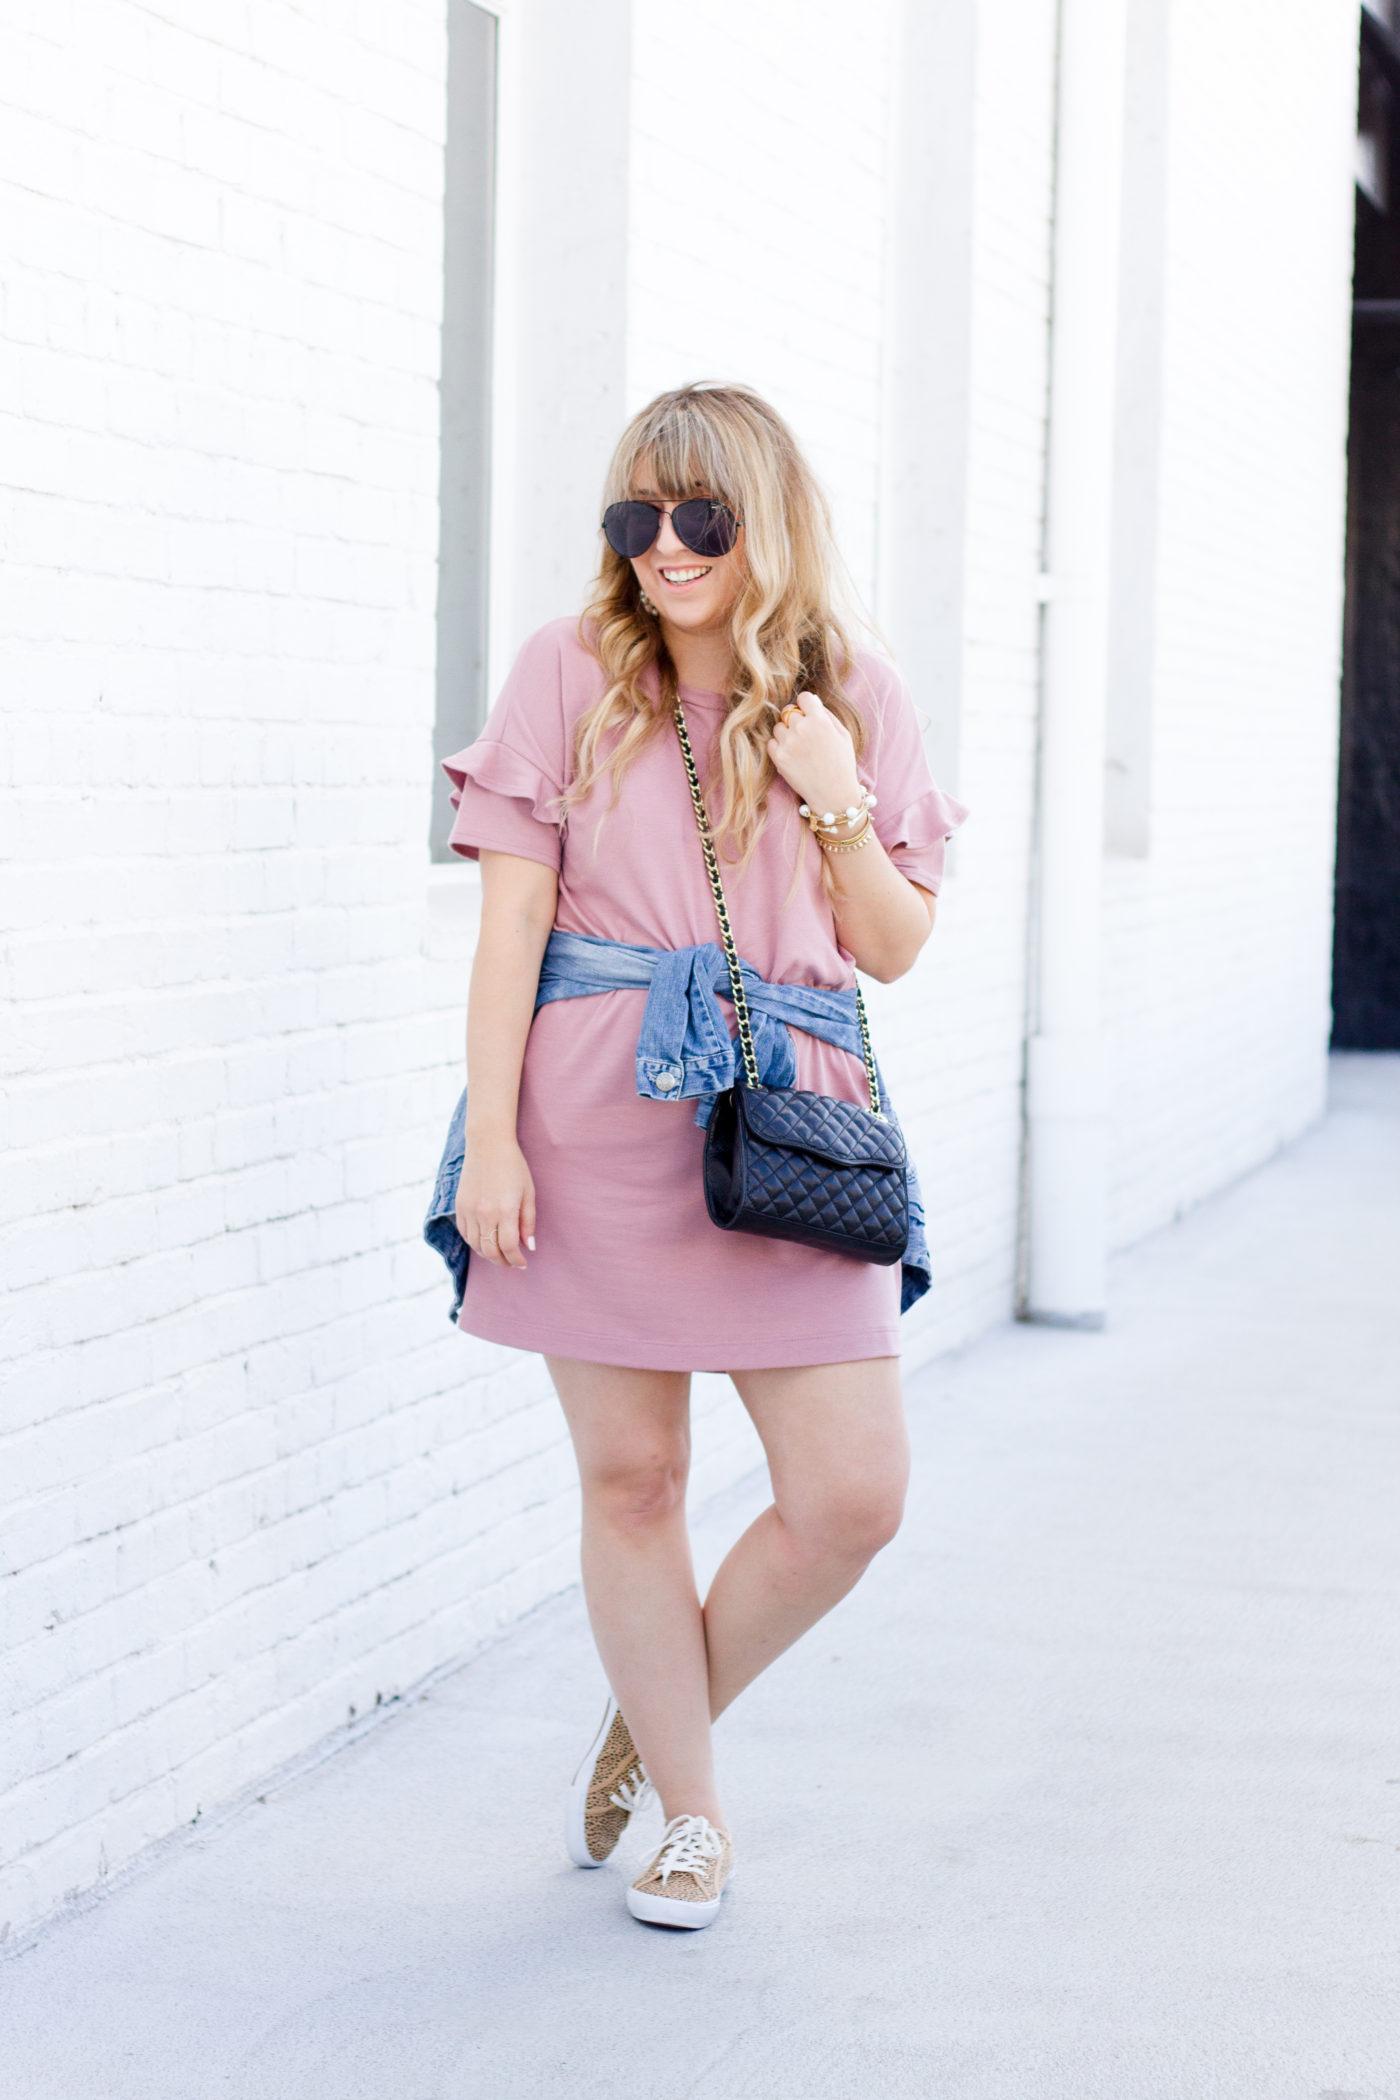 Cute casual tshirt dress outfit